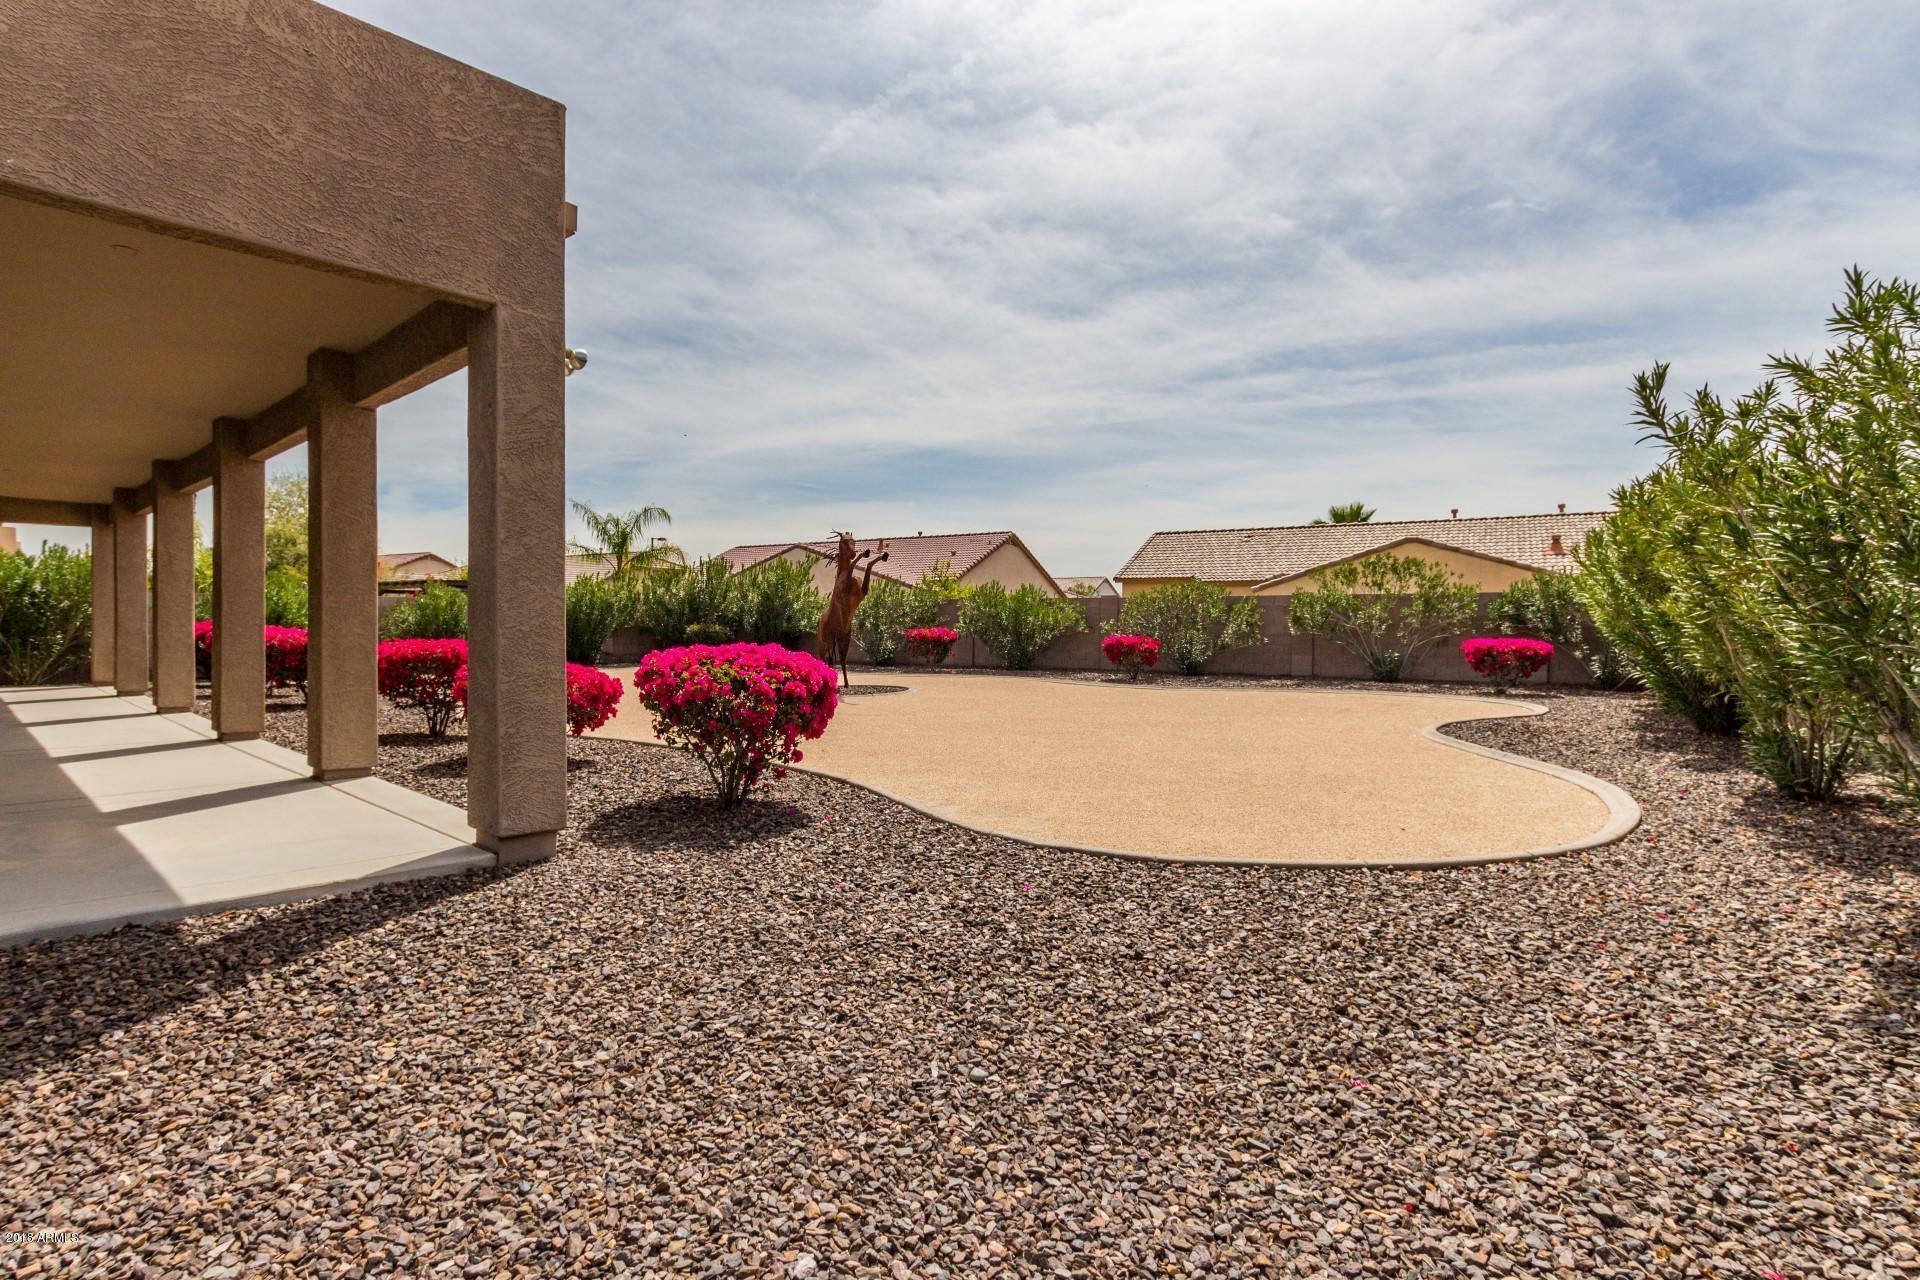 MLS 5740574 13409 W SOLANO Drive, Litchfield Park, AZ 85340 Litchfield Park AZ Dreaming Summit